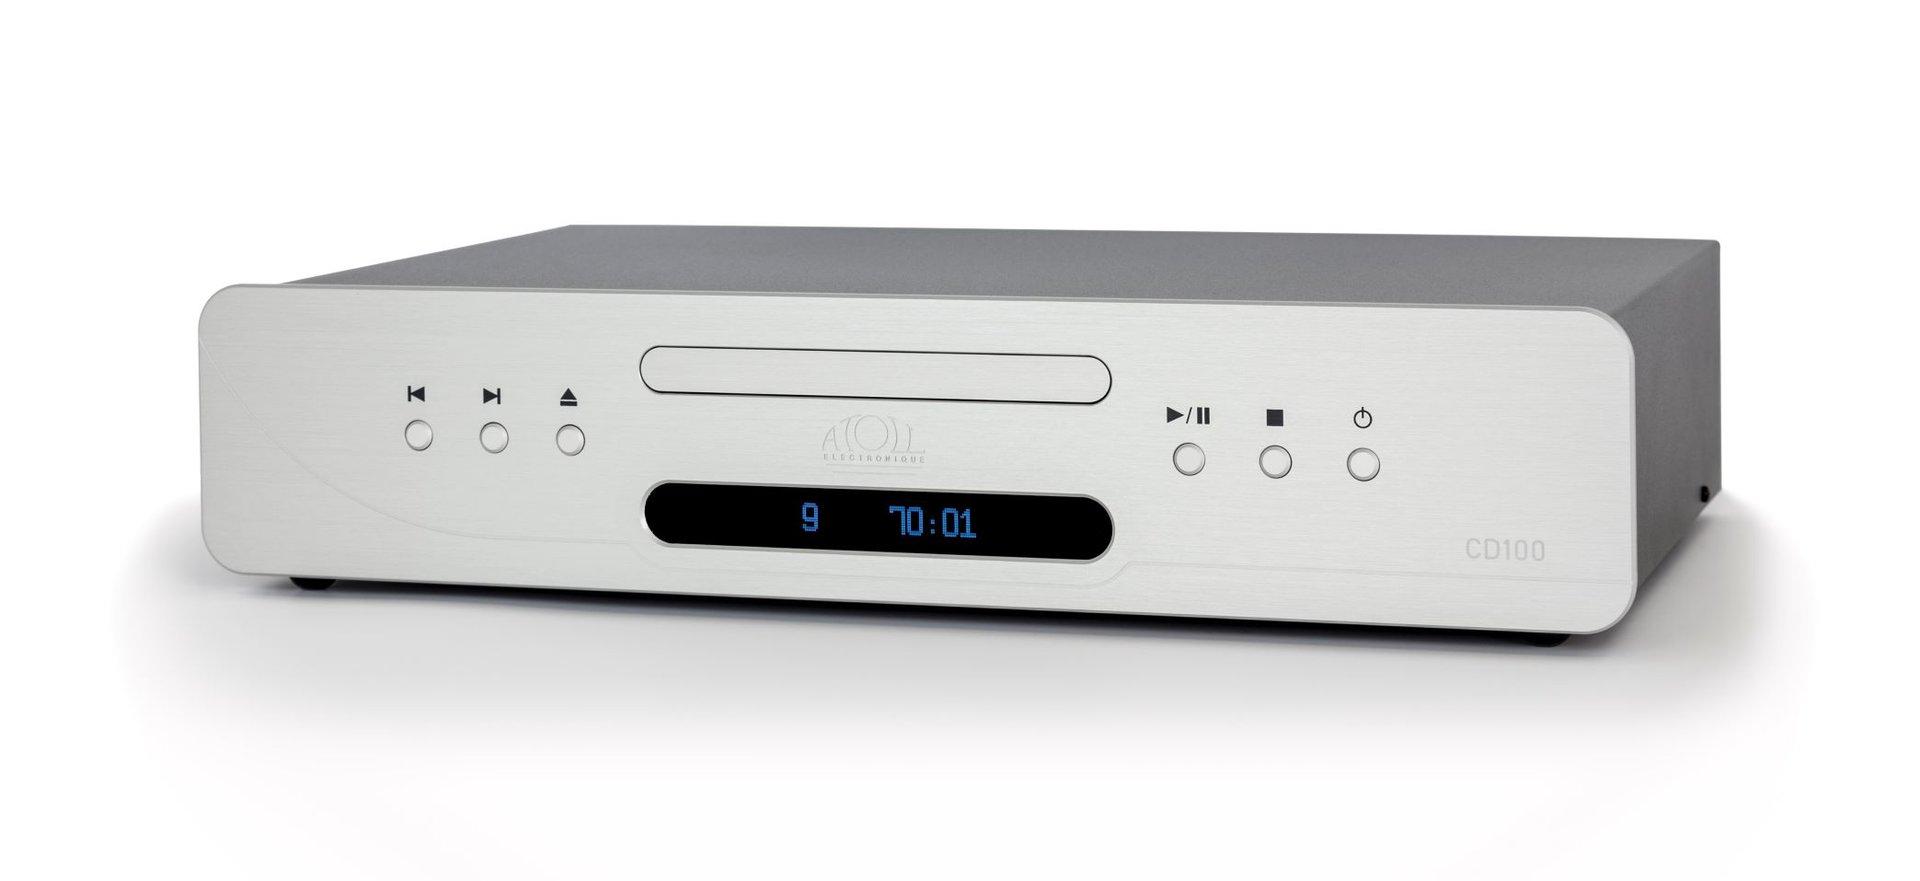 CD100-SIG-SILVER-fond-dégradé.jpg